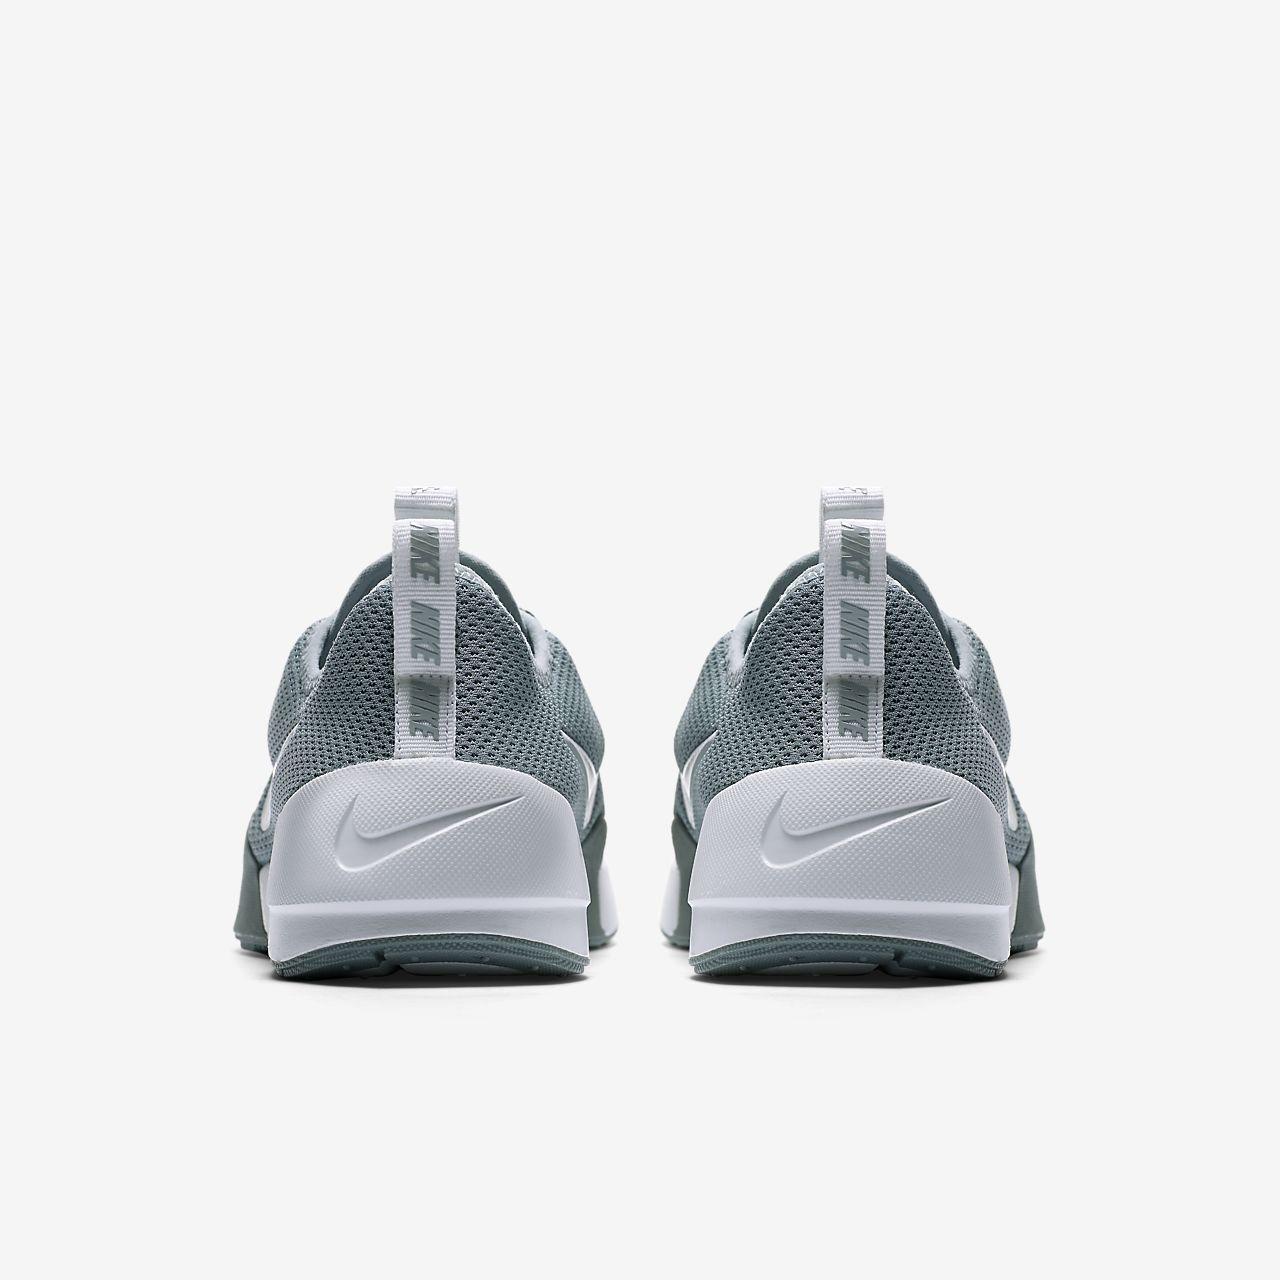 Ashin Pour Modern Chaussure Run FemmeCa Nike JT1cFlK